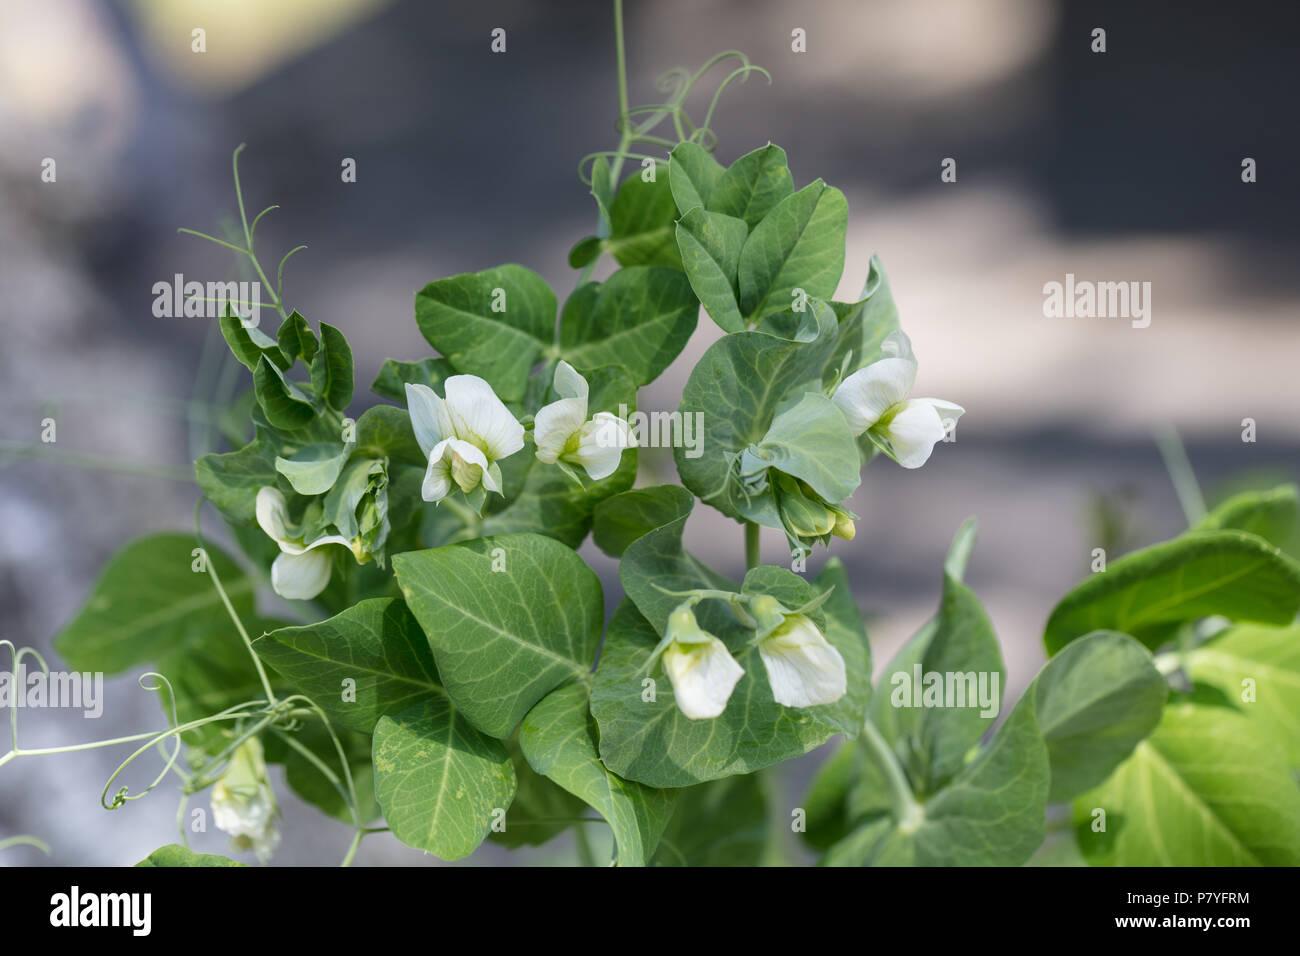 'Grijze roodbloeiende' Garden pea, Sockerärt (Pisum sativum) - Stock Image